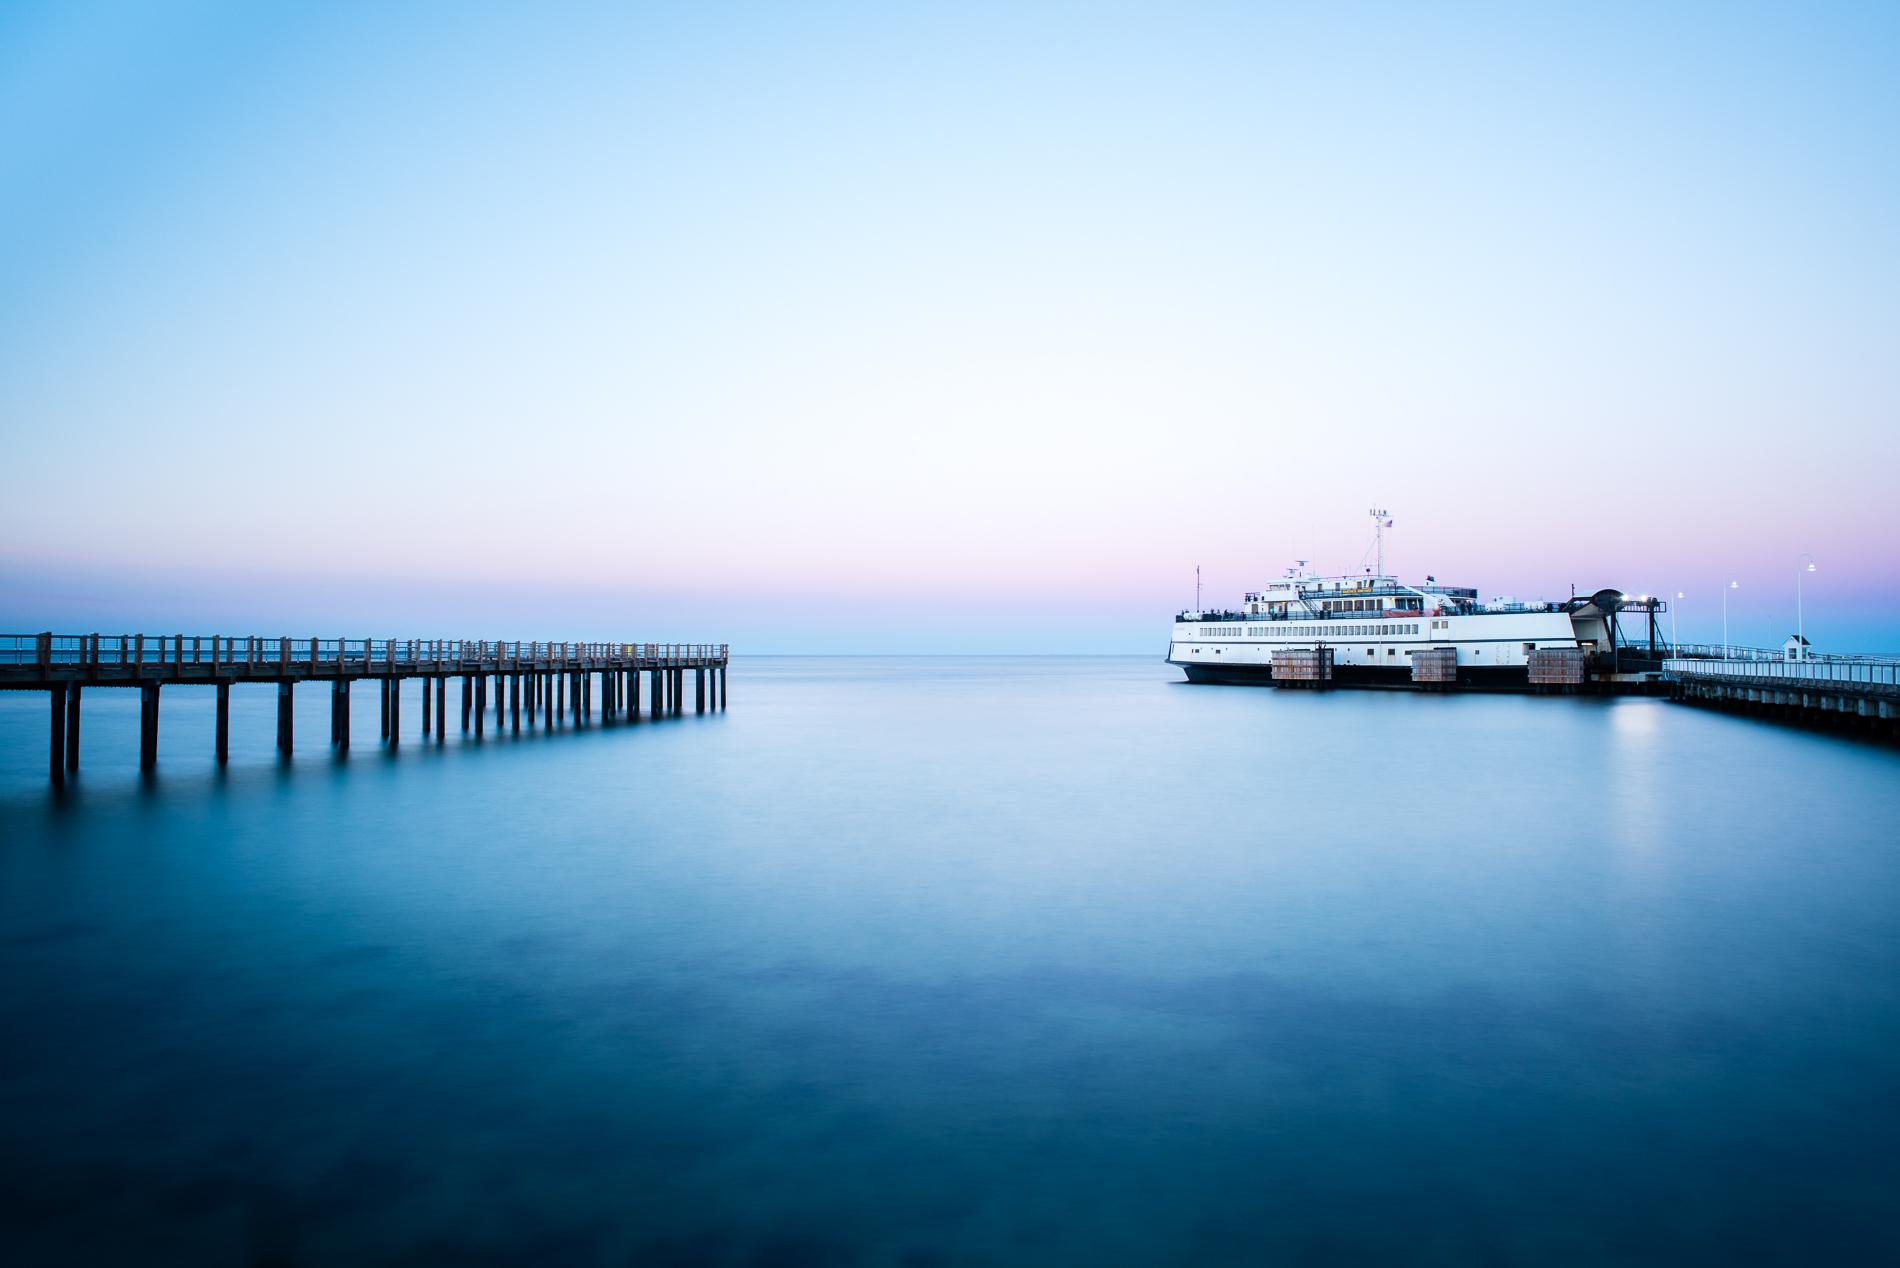 Ferry Martha's Vineyard docked at Oak Bluffs, by Alison Shaw